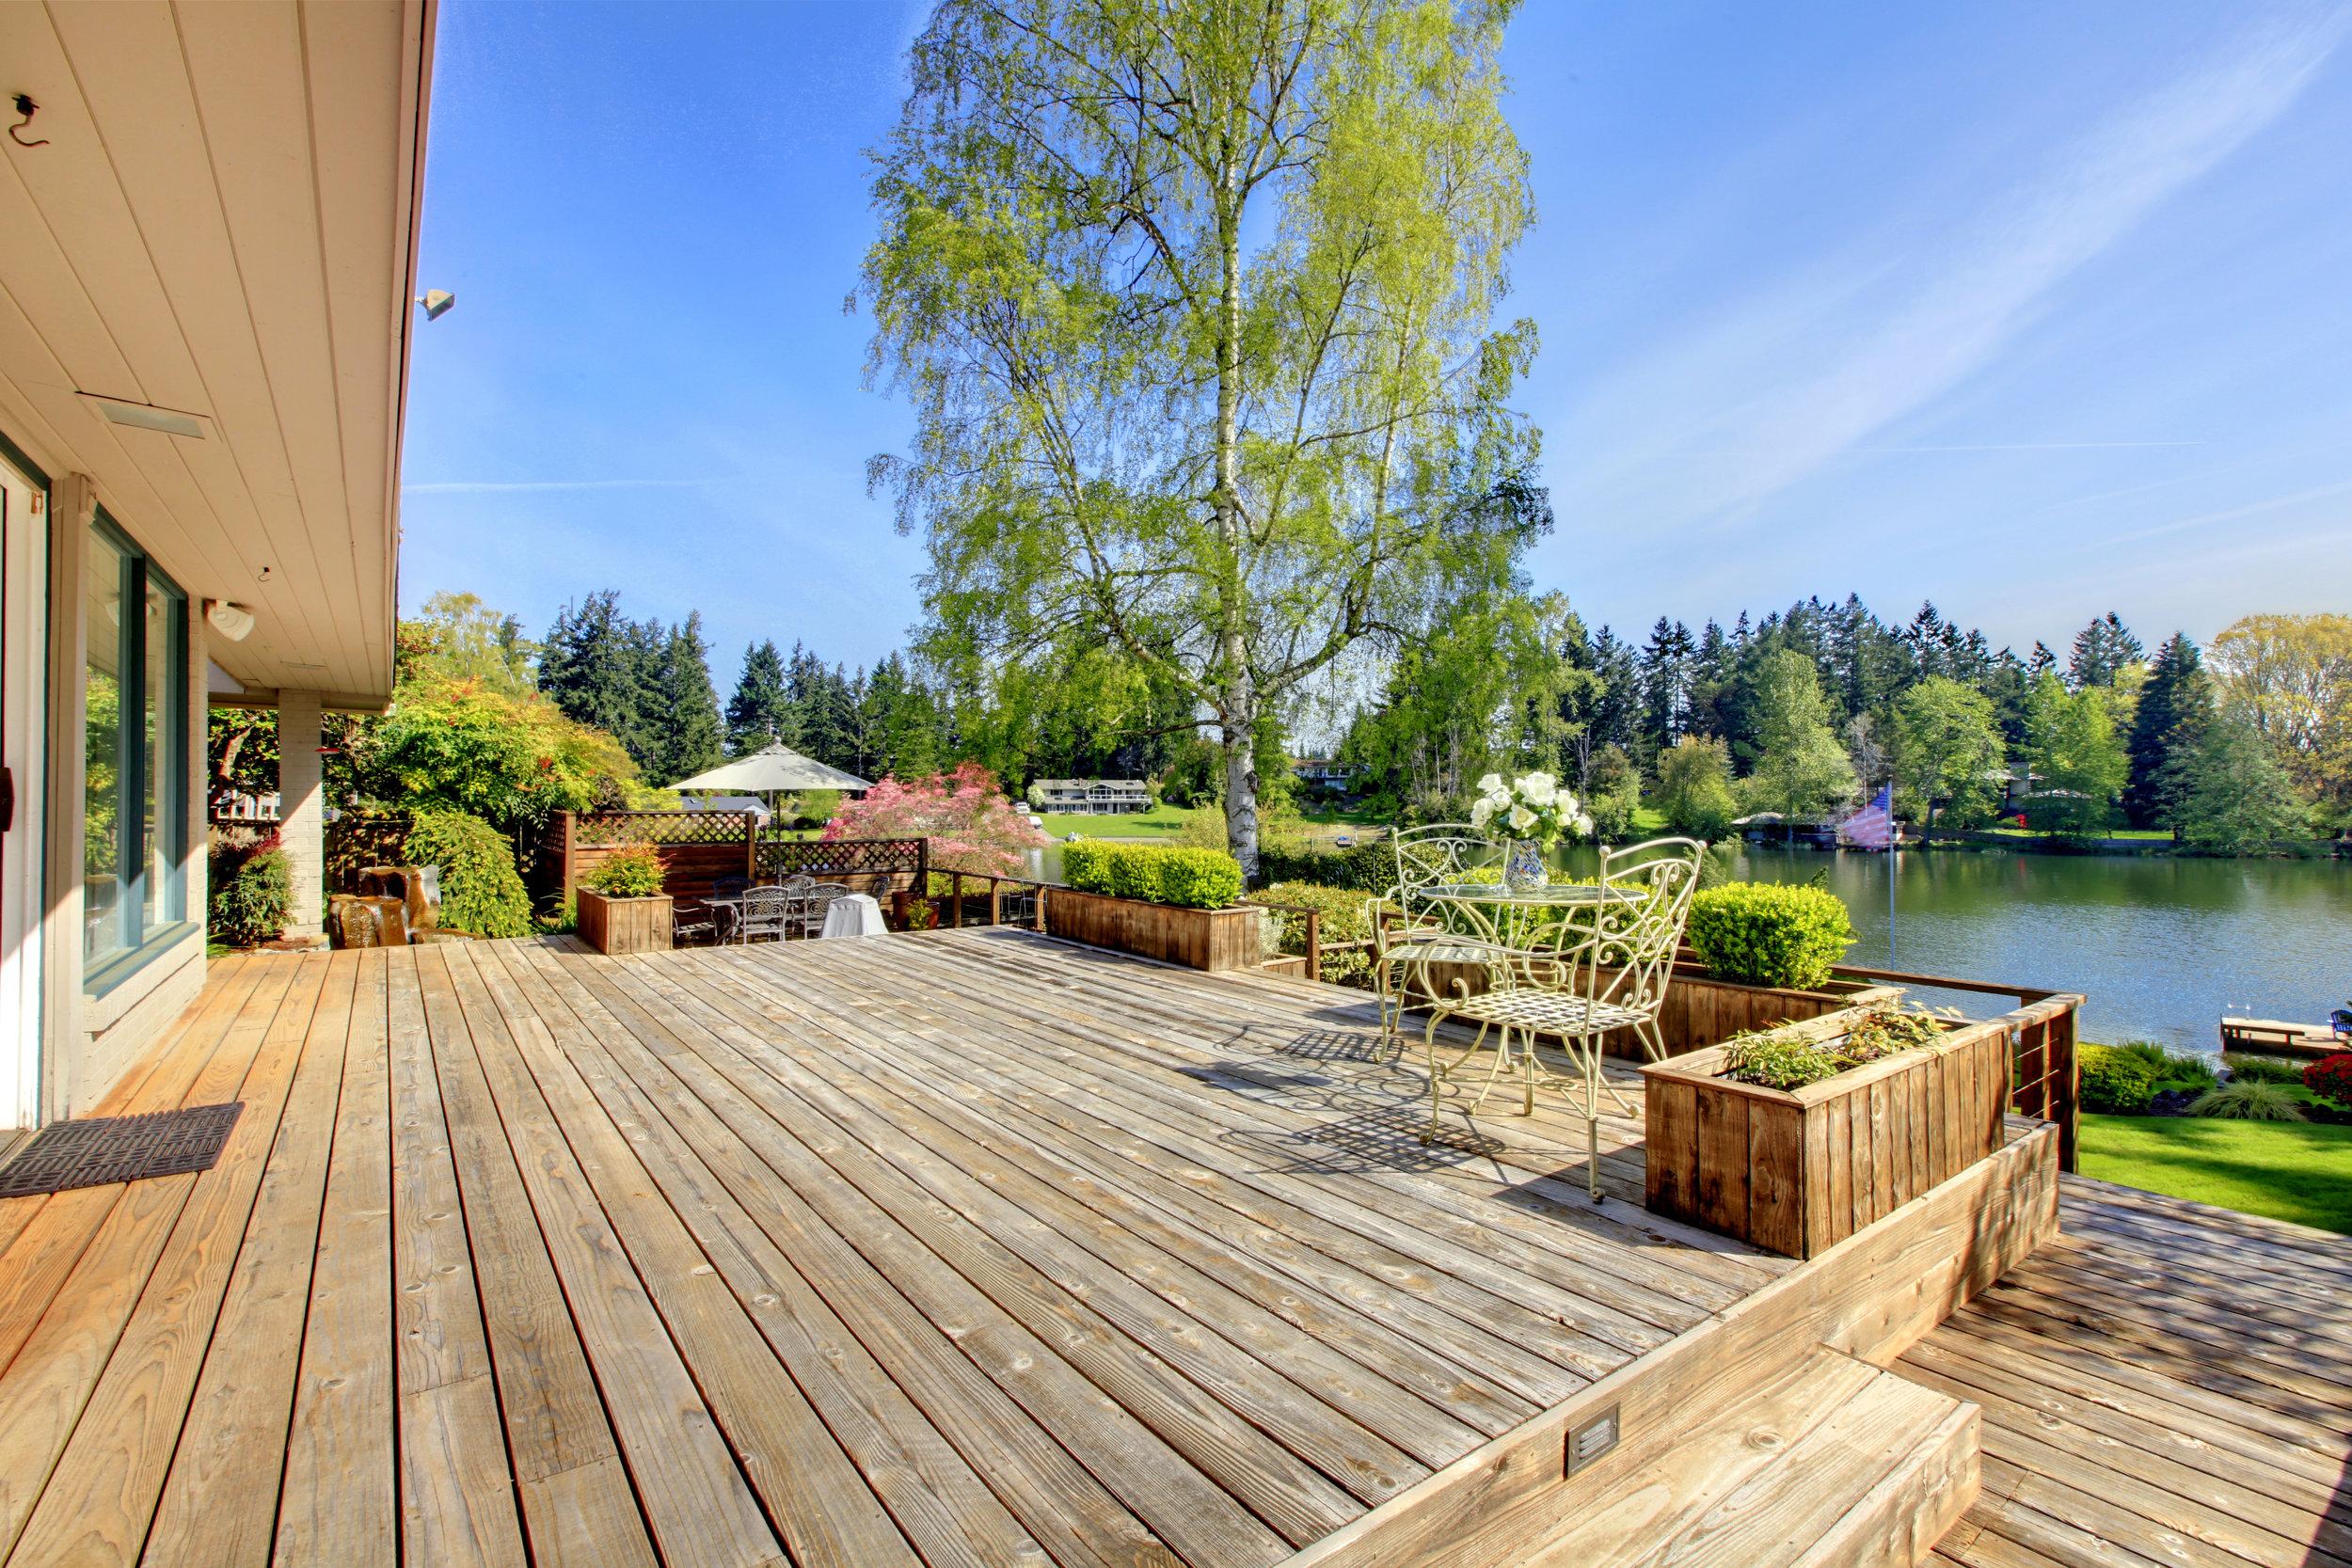 real wood - deck boards- Adobe Deck Photo 2.jpeg